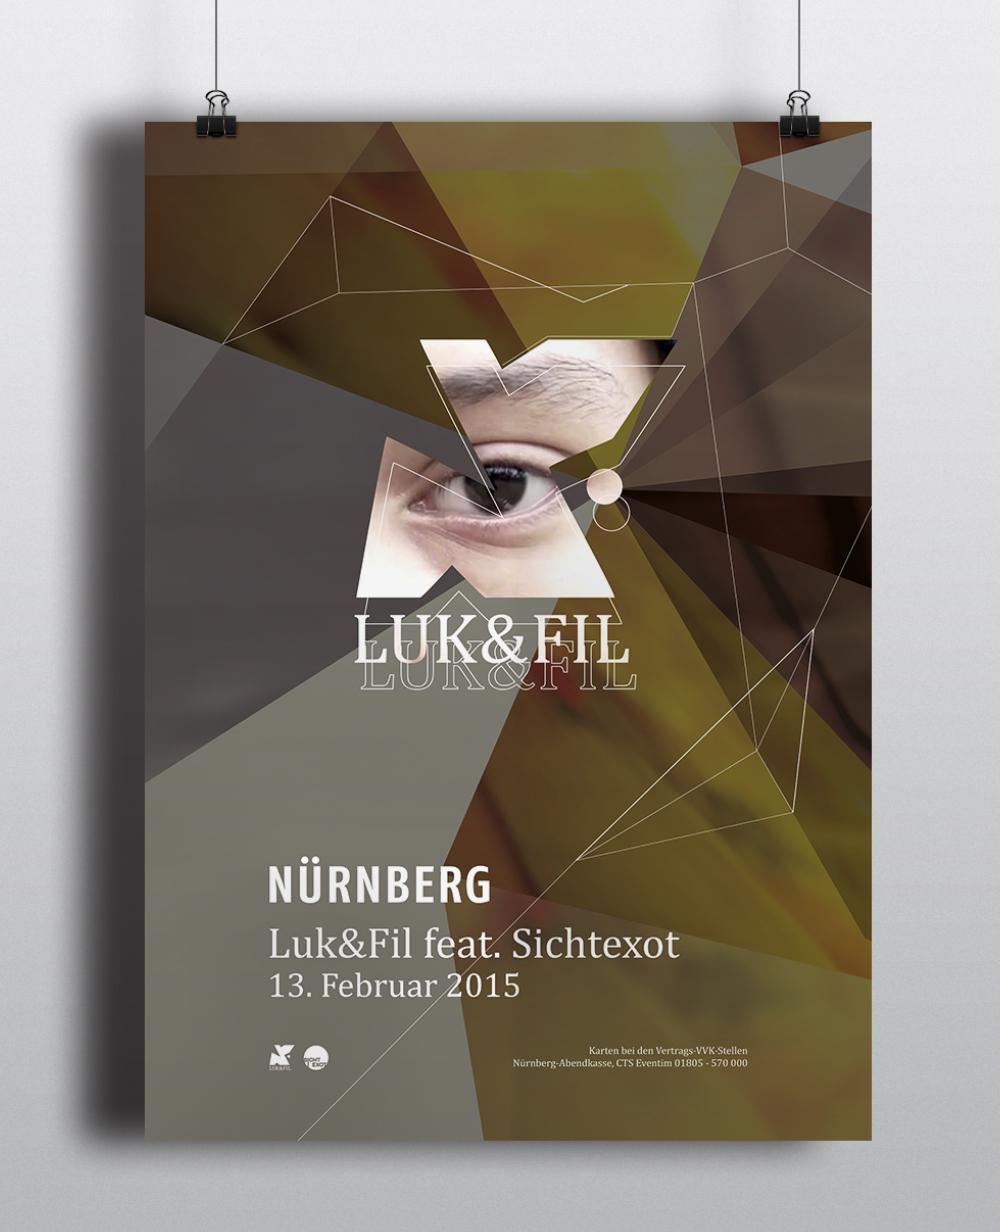 Corporate Design Portfolio - Schreiber Tobias - Luk & Fil Plakatgestaltung Corporate Design Key-Visual